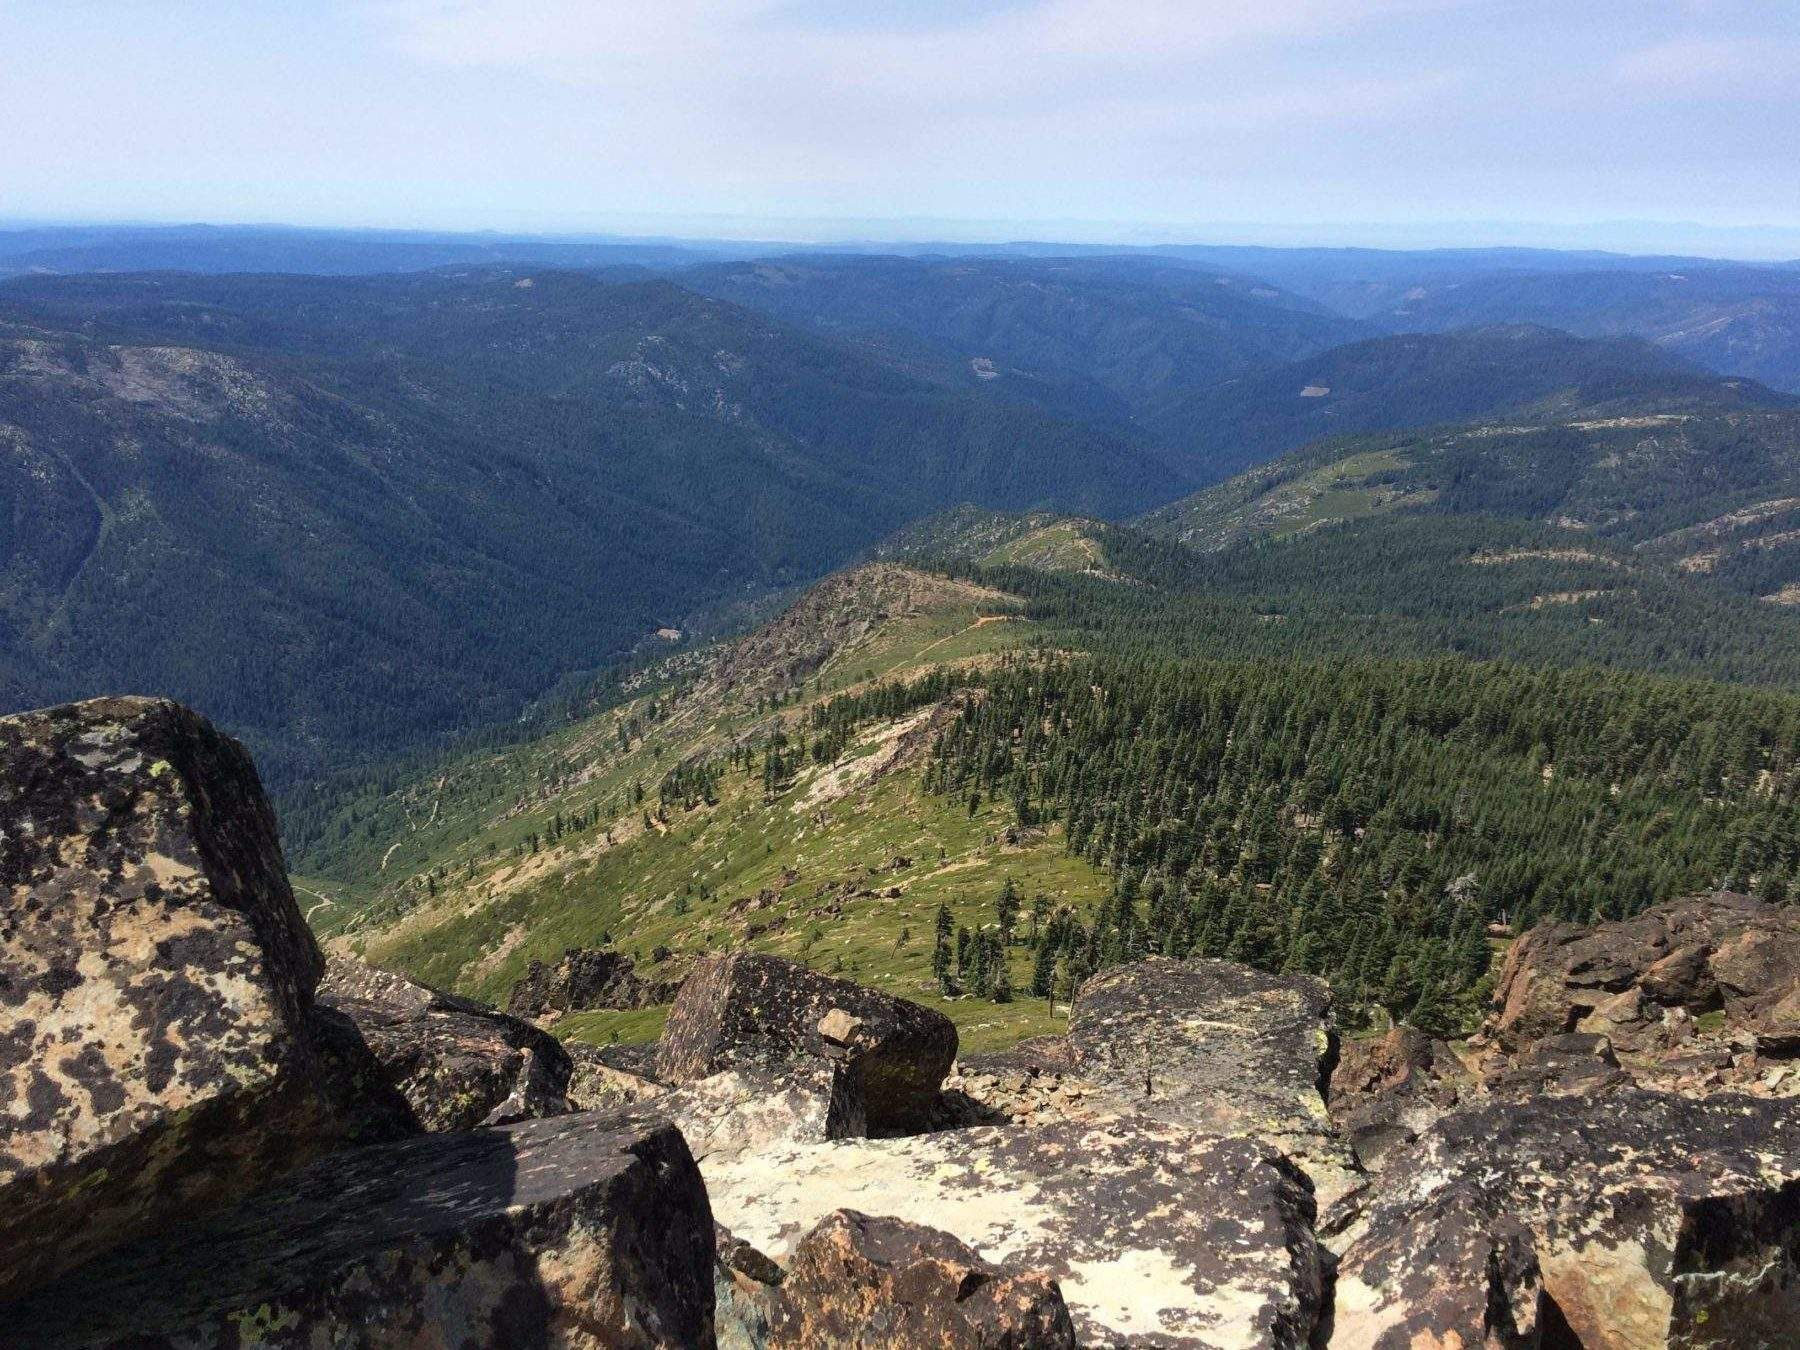 From Sierra Buttes